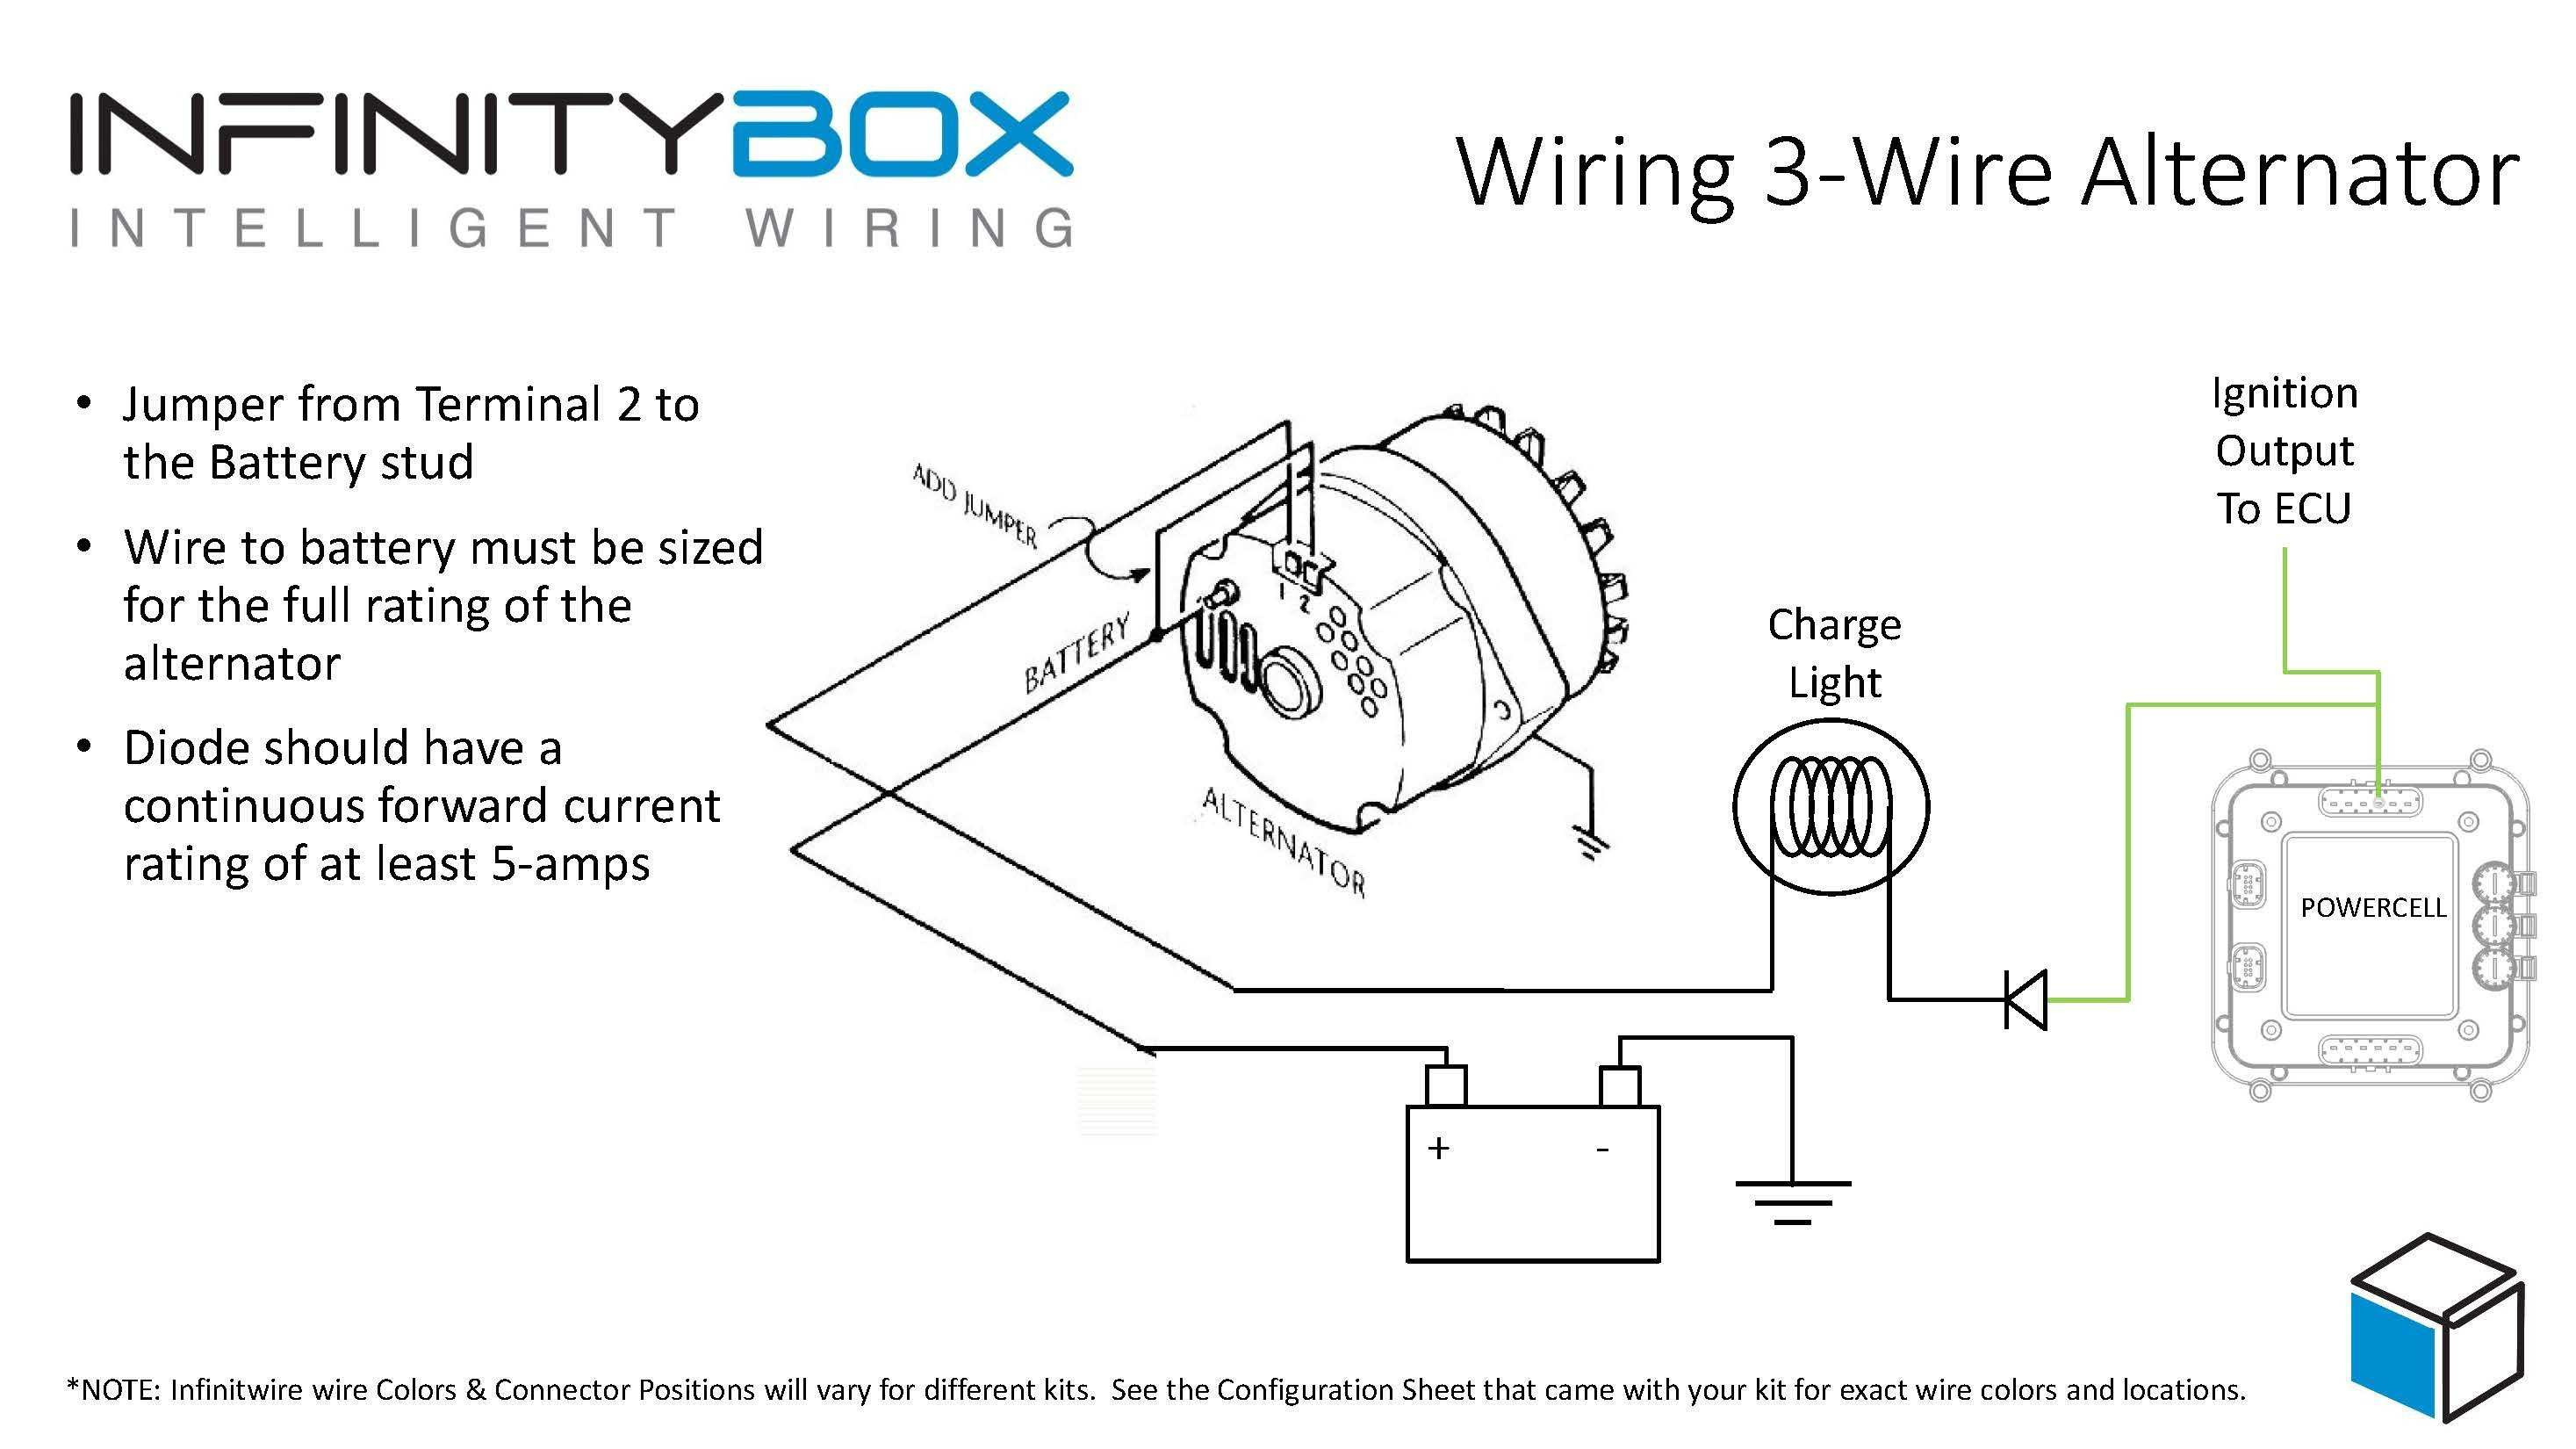 delco 3 wire alternator wiring diagram Download-Wiring Diagram Vw Alternator Valid Awesome 3 Wire Alternator Wiring Diagram Diagram 15-o